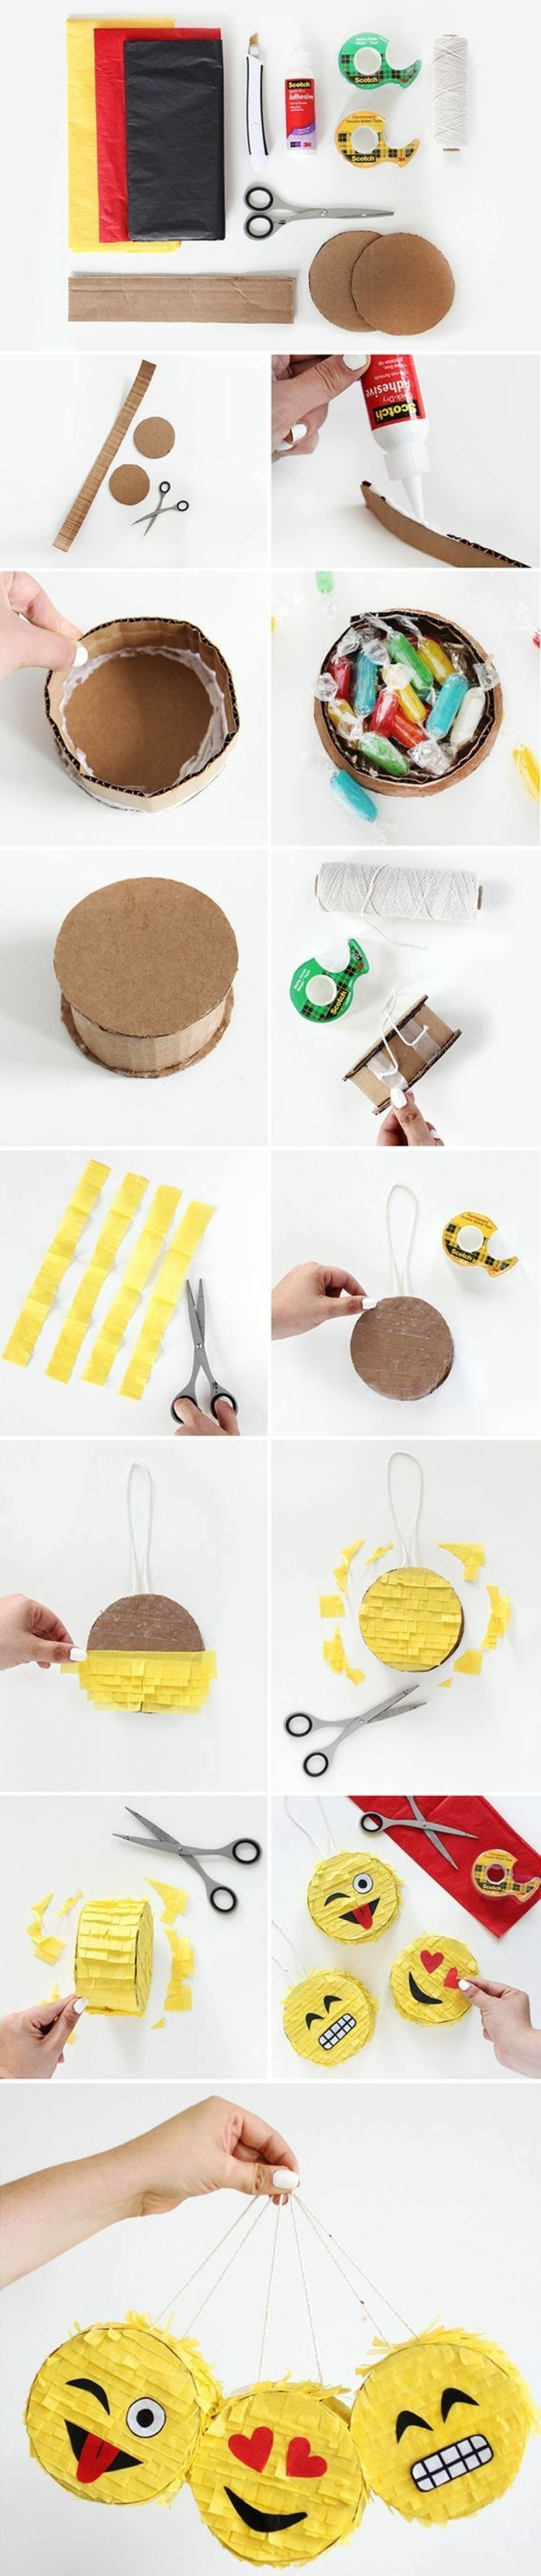 pinata basteln - buntes papier, karton, schere, bonbons